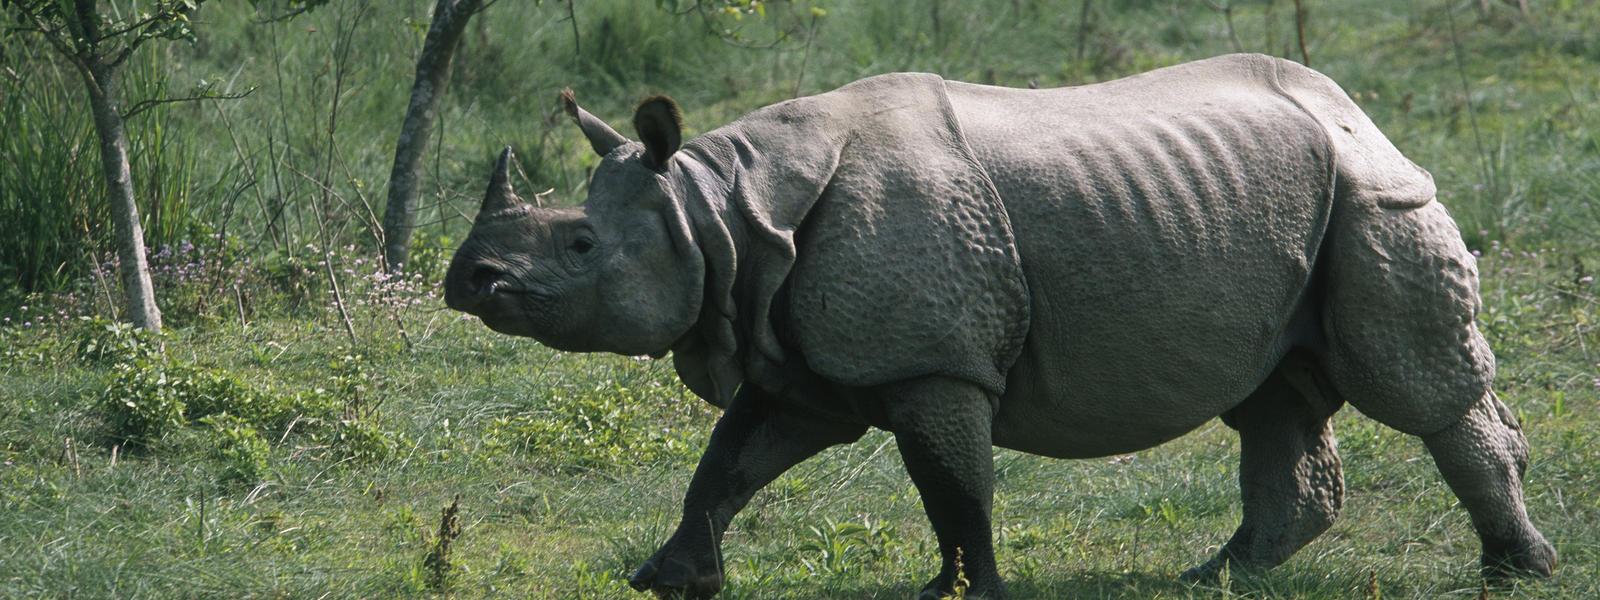 Greater_One_Horned_Rhino_8.6.2012_Hero_and_Circle_HI_107996